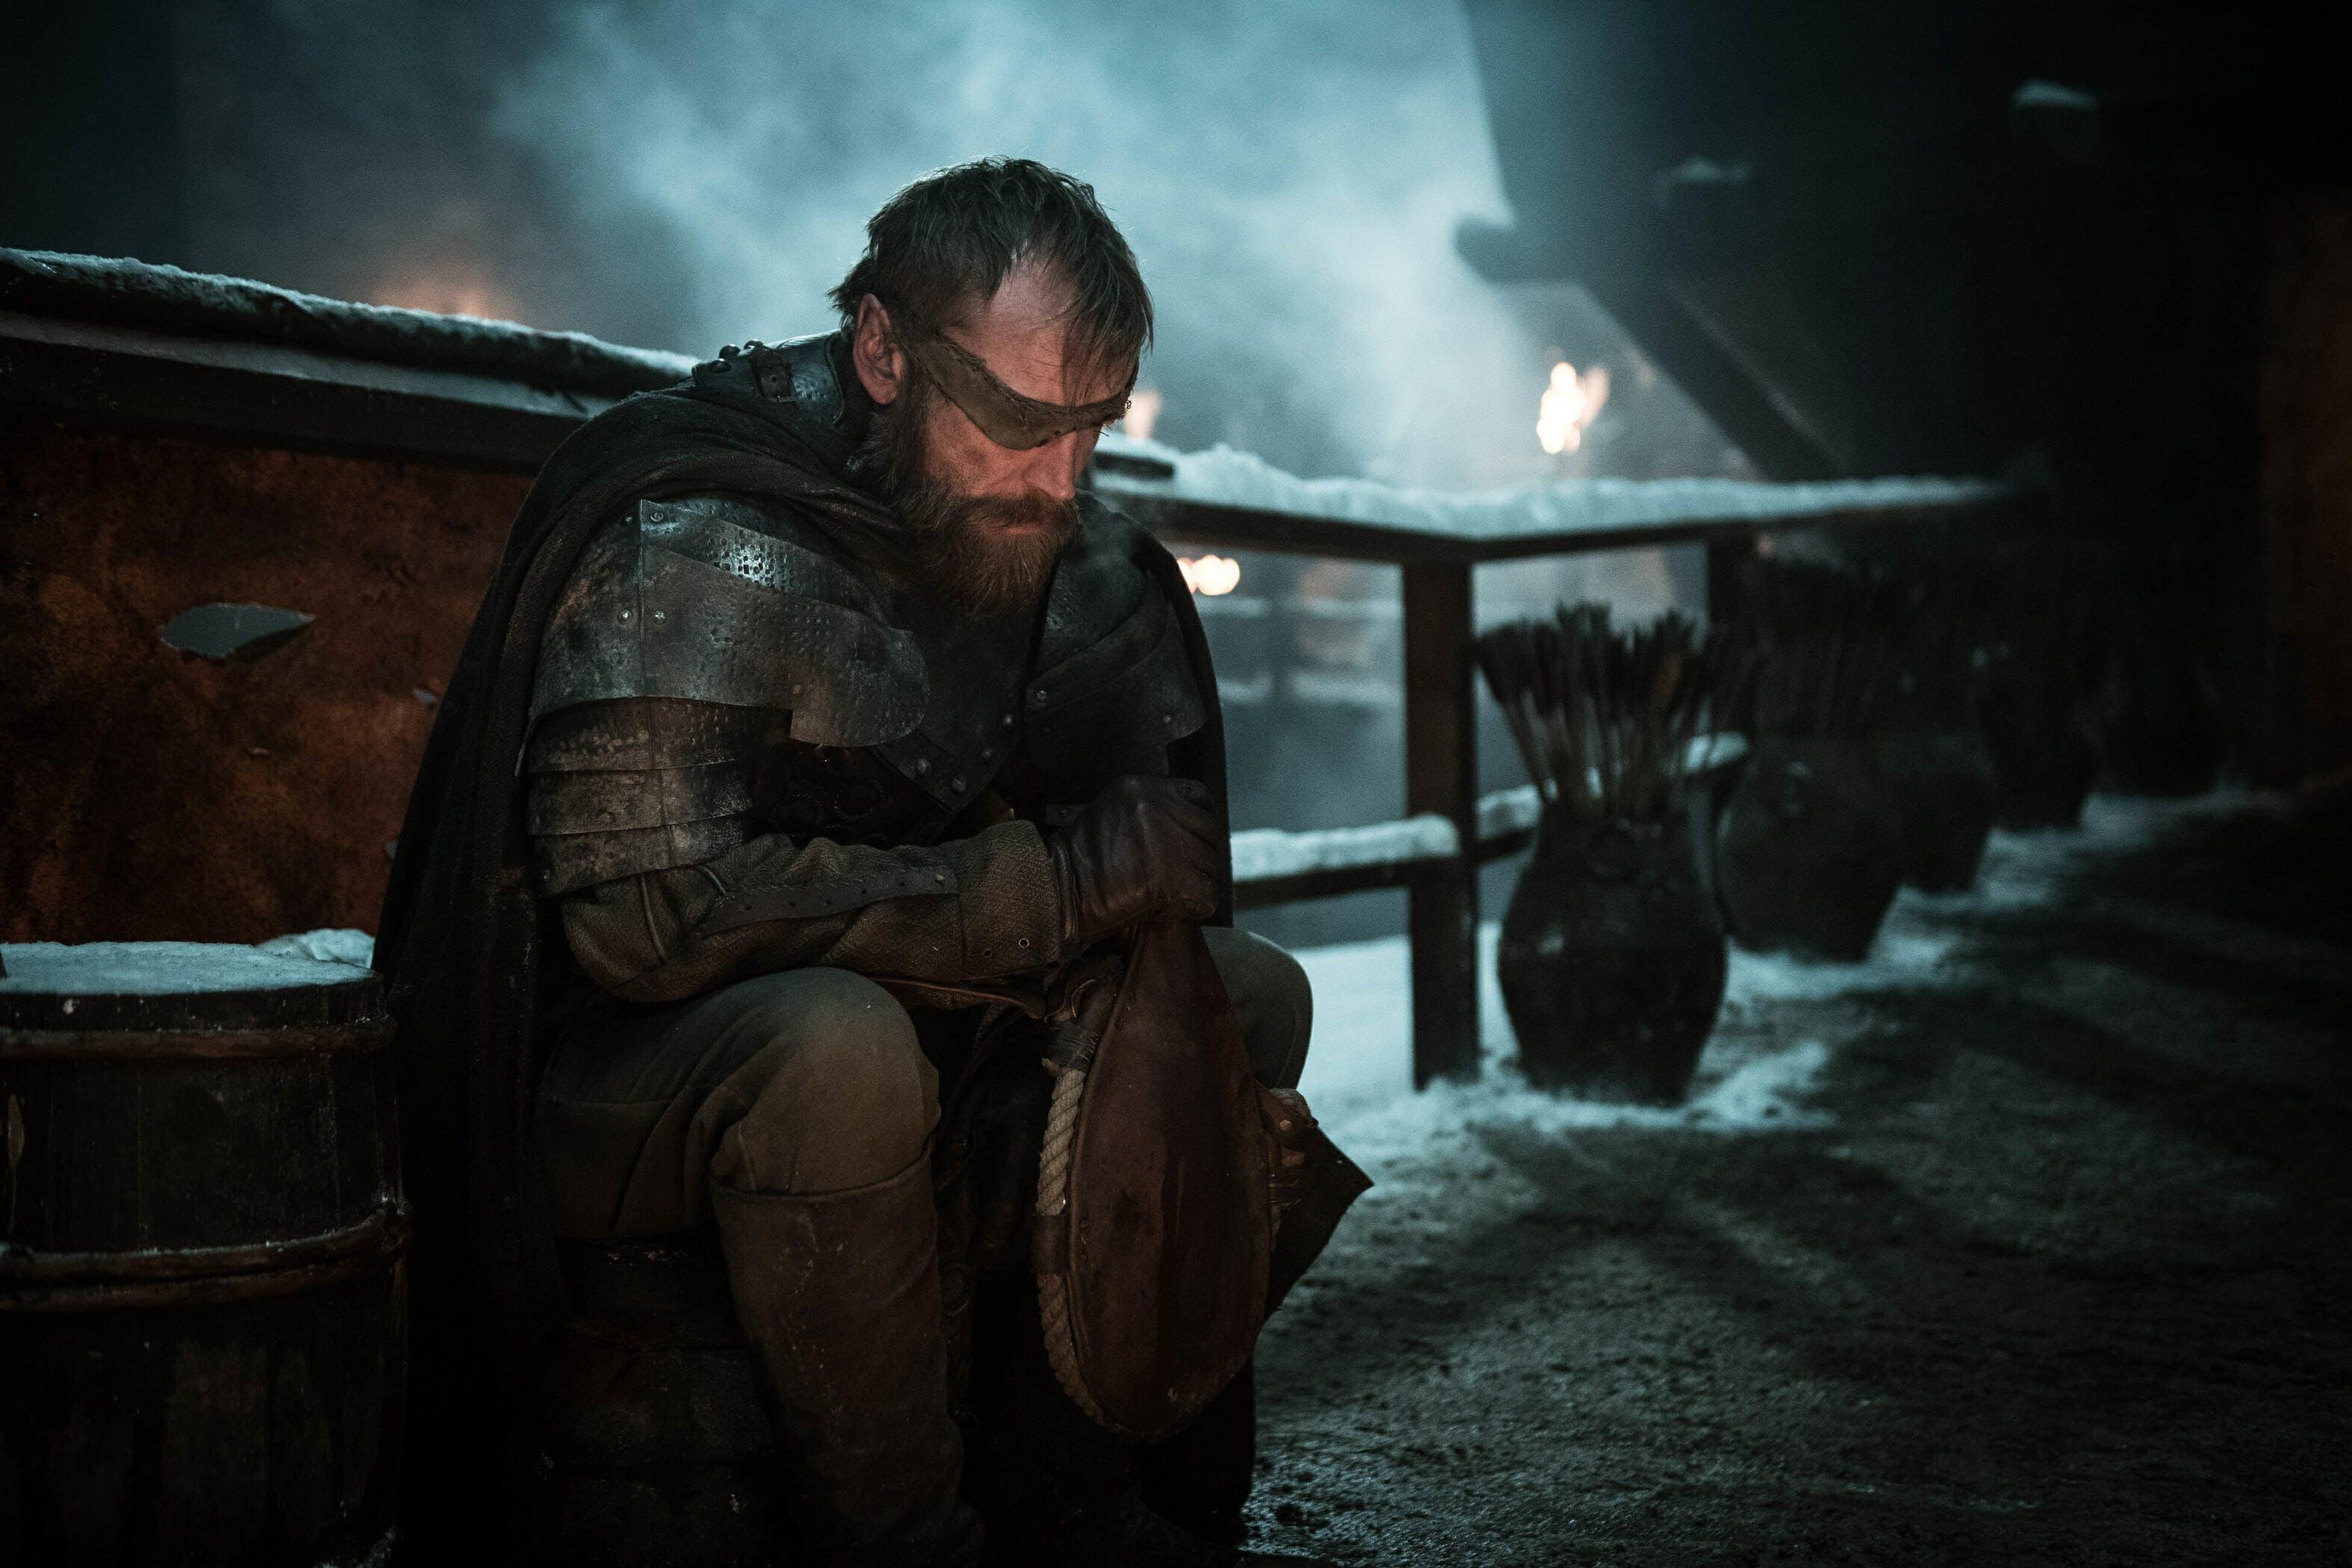 Game of Thrones armies - Beric